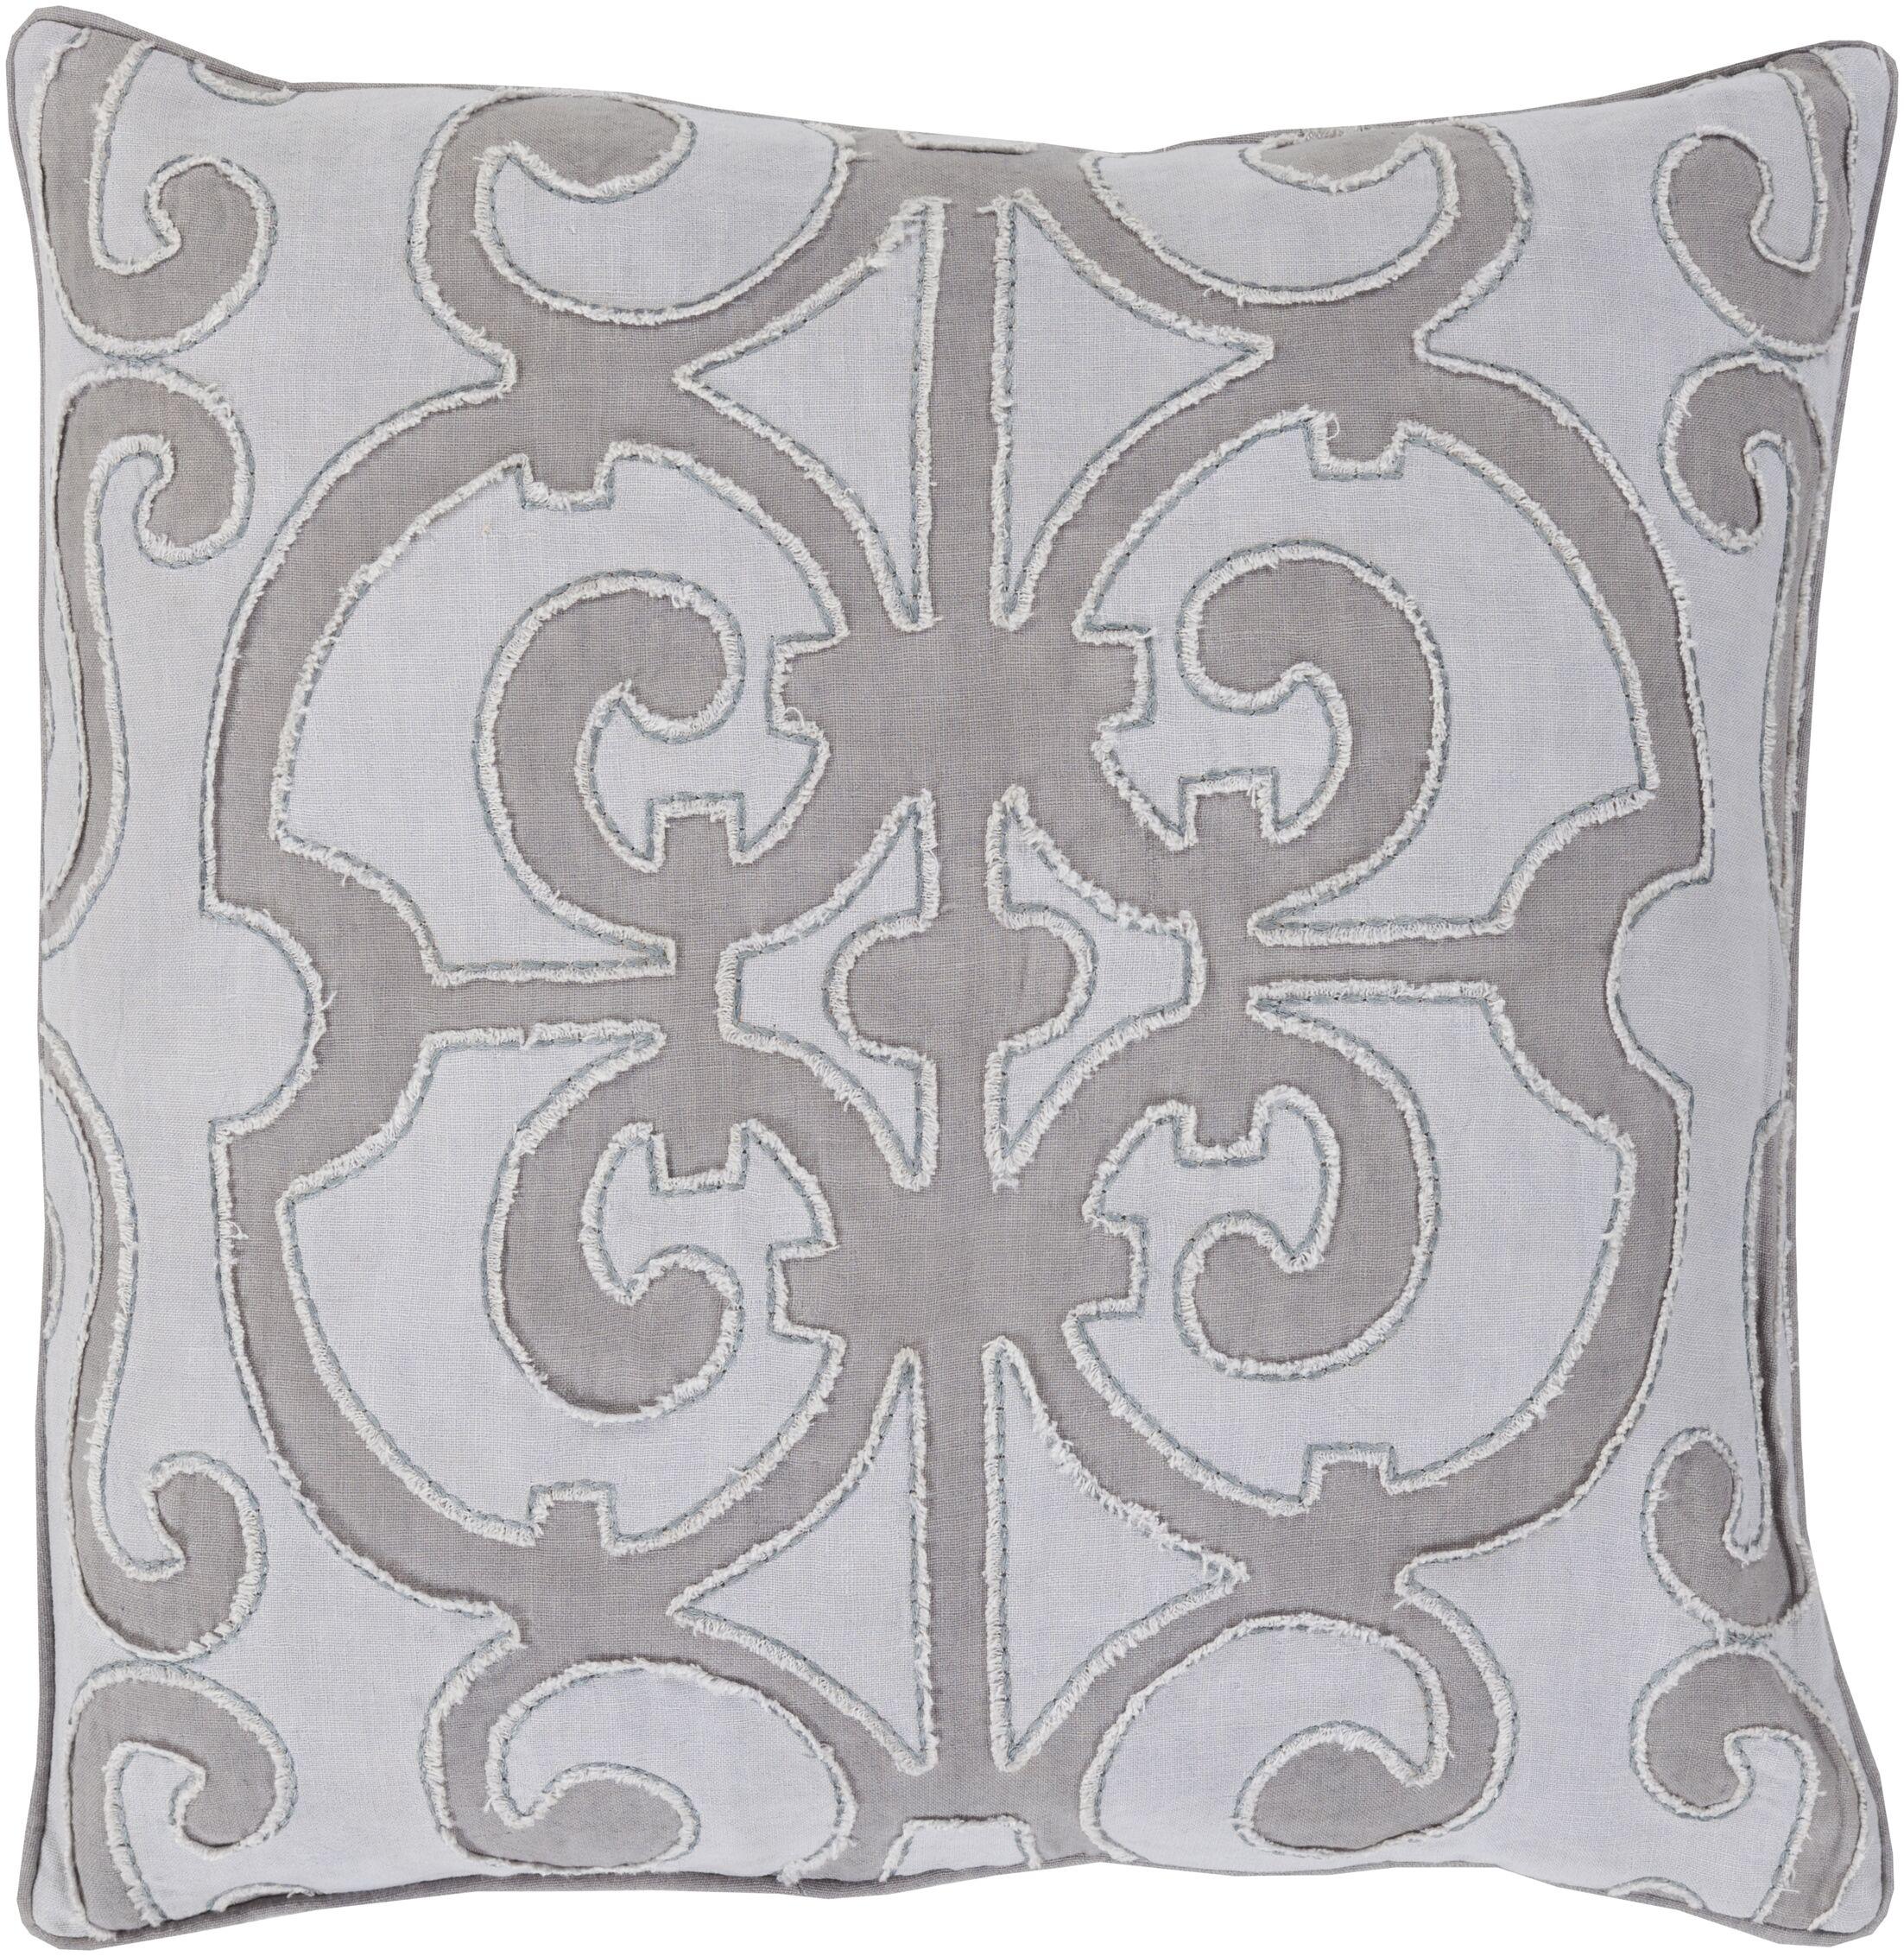 Rushford Linen Throw Pillow Color: Medium Gray/Lavender, Size: 22